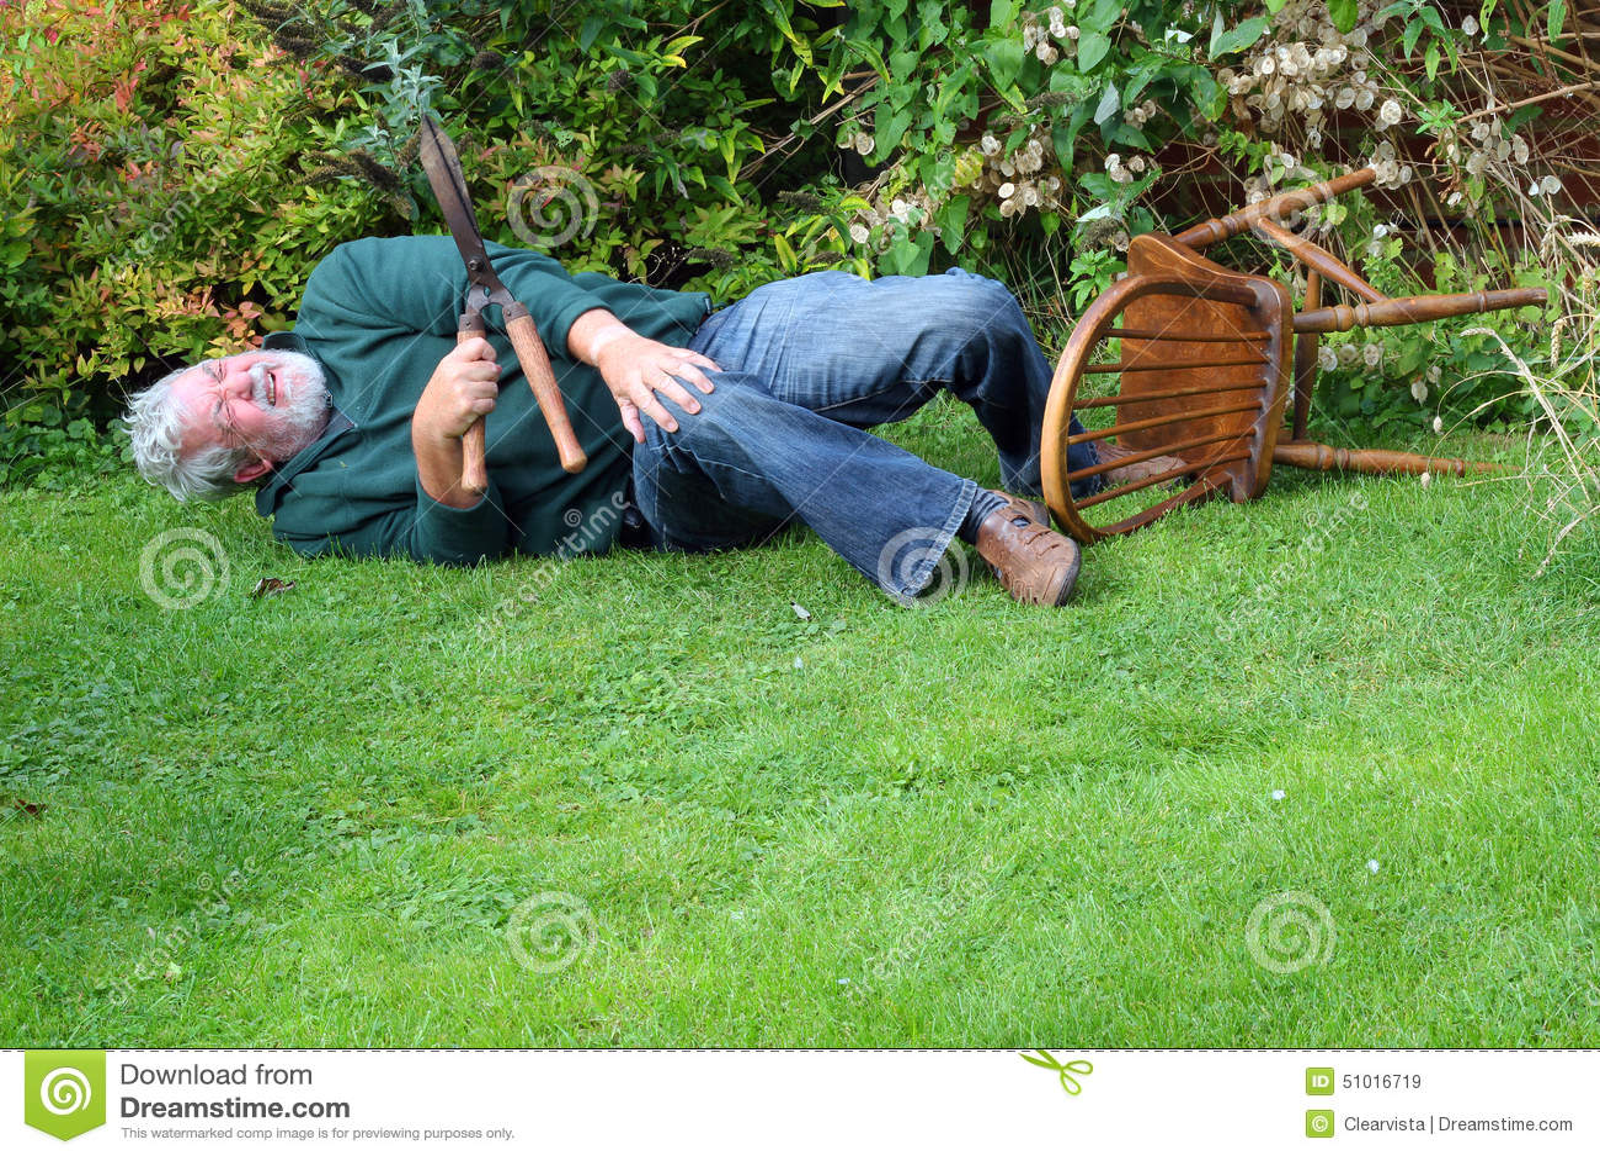 Accident, Garden Fallen Over. Danger. Stock Photo - Image ...